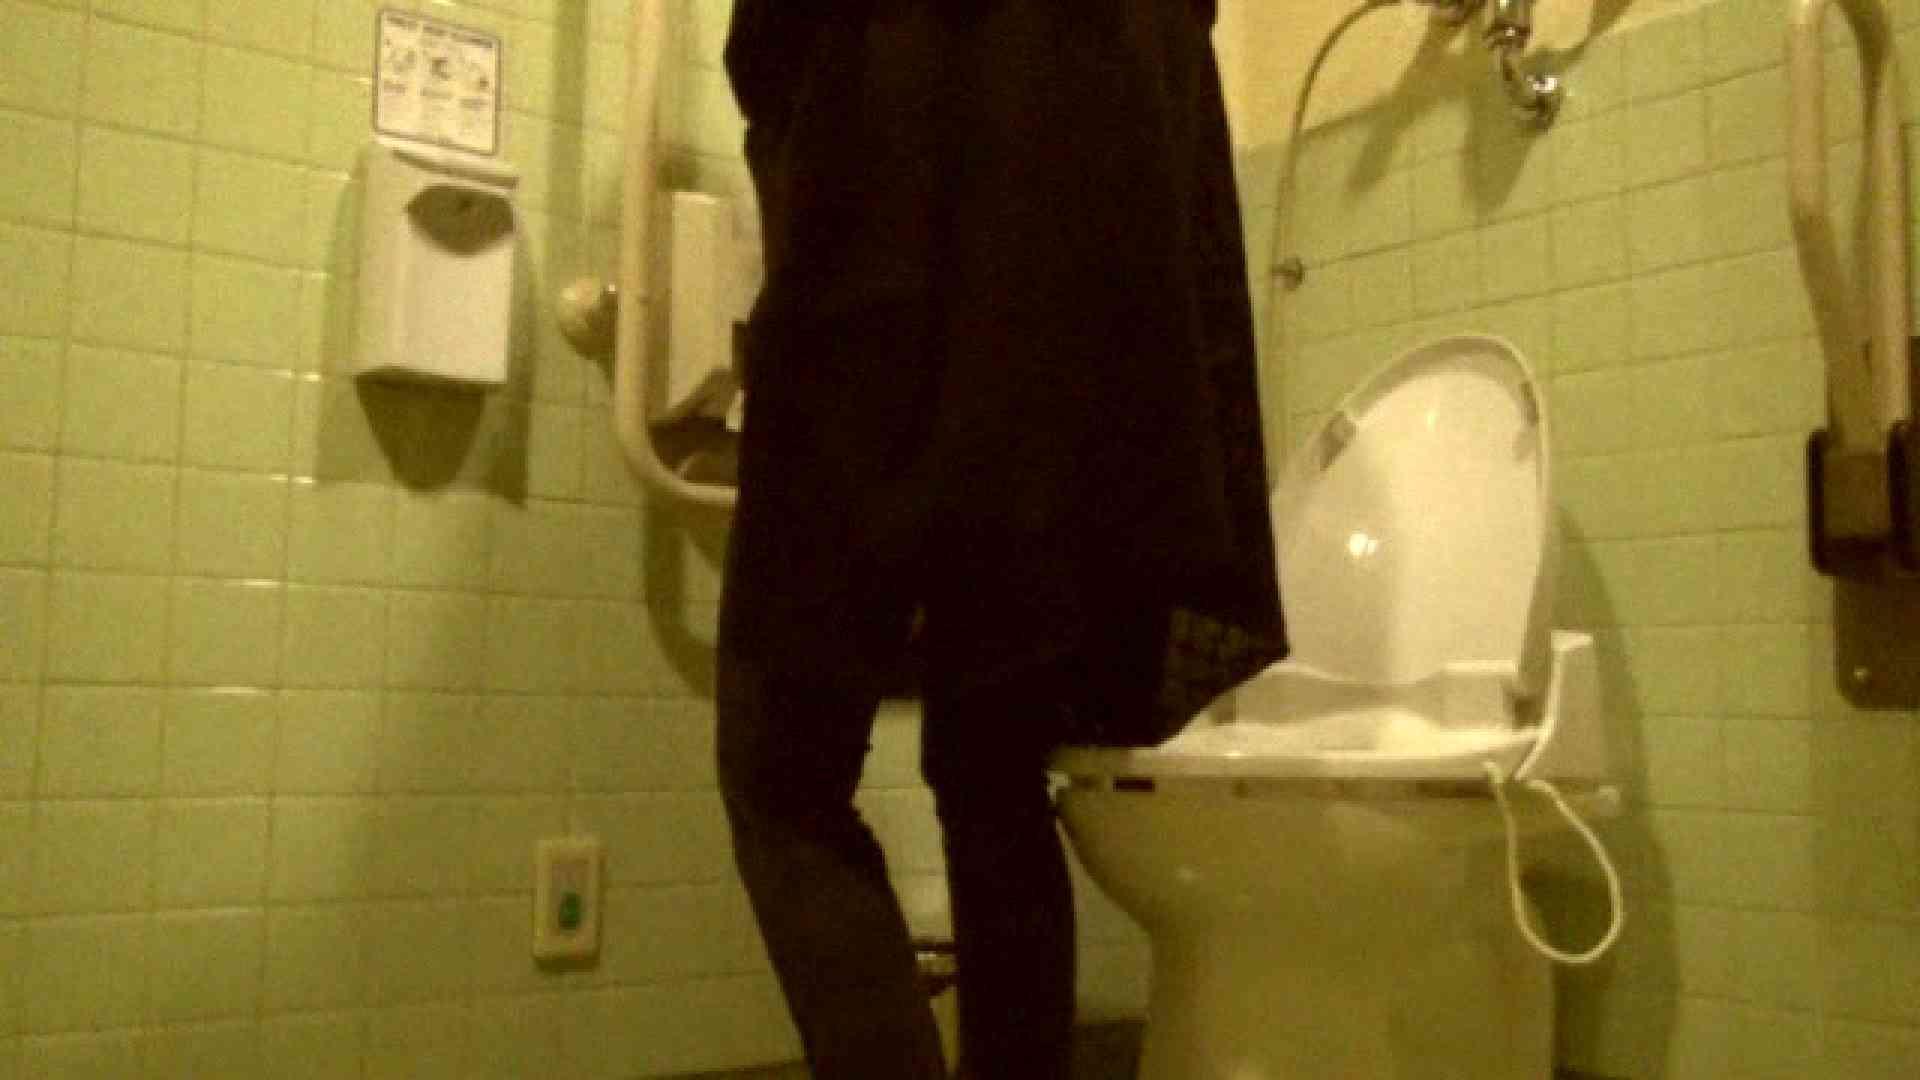 vol.26 【SKちゃん(洗面所)】ガールズバー店員 19歳 イタズラ 盗撮セックス無修正動画無料 50連発 12